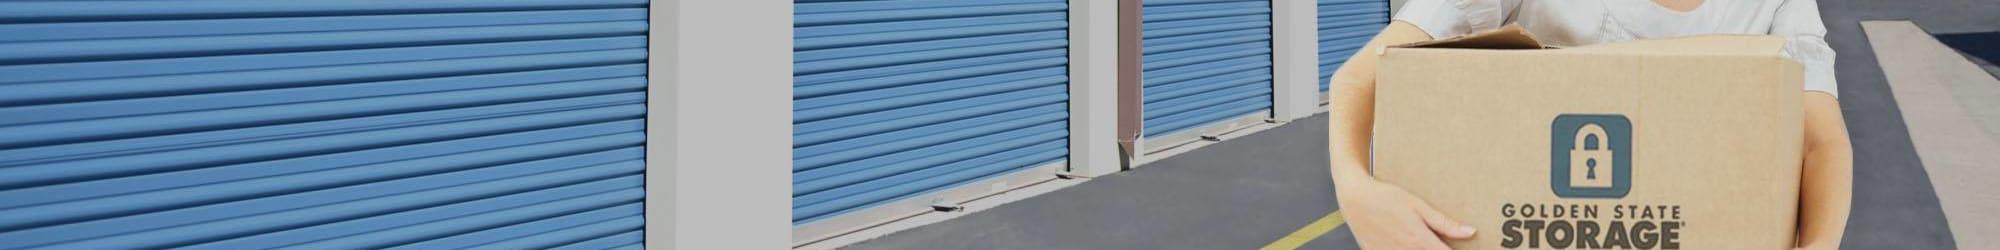 Facility Benefits at Golden State Storage - Gardena in Gardena, California